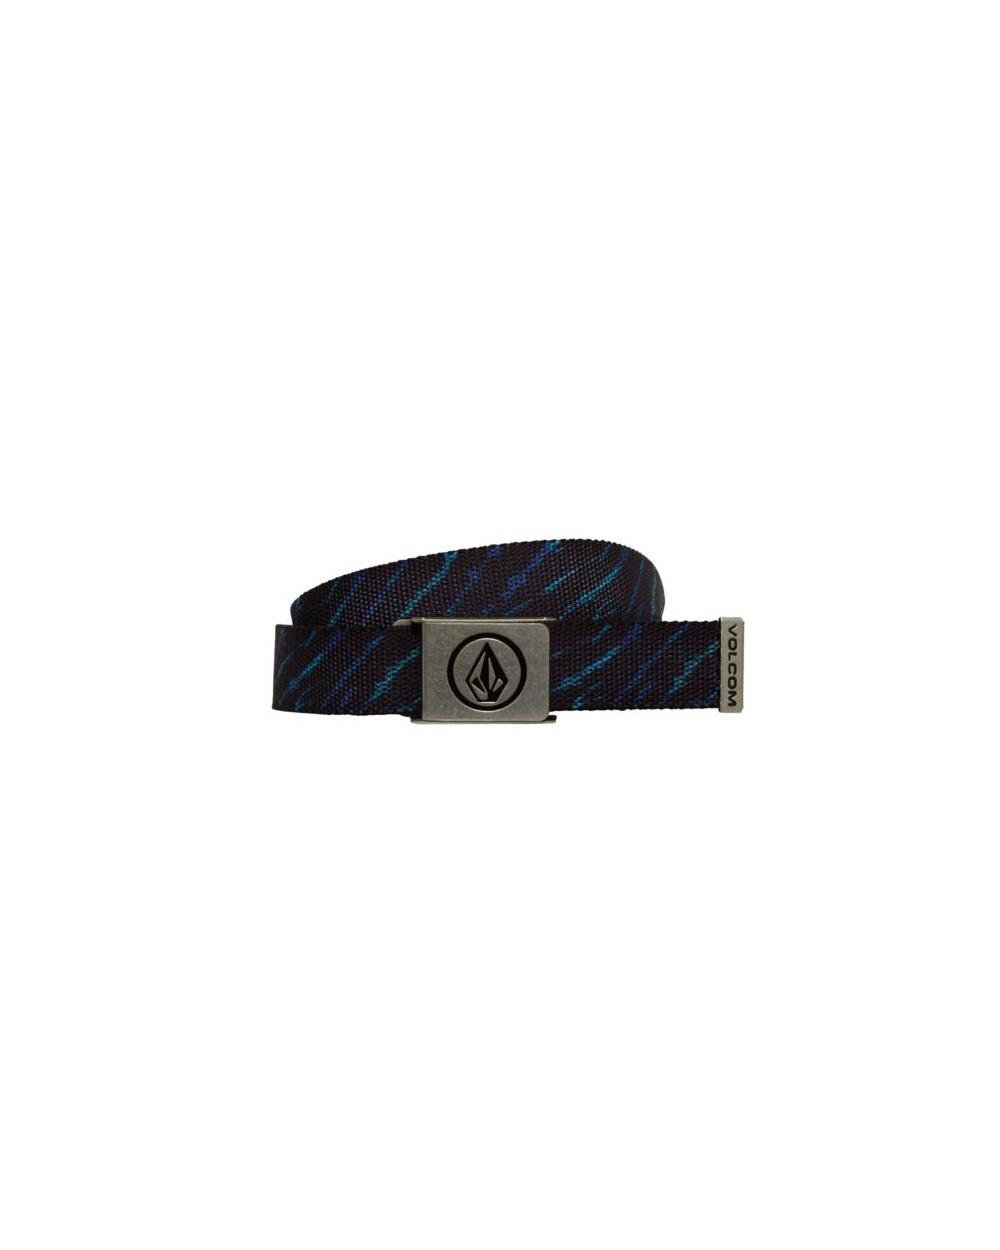 Volcom Circle Web Belt - Tie Dye